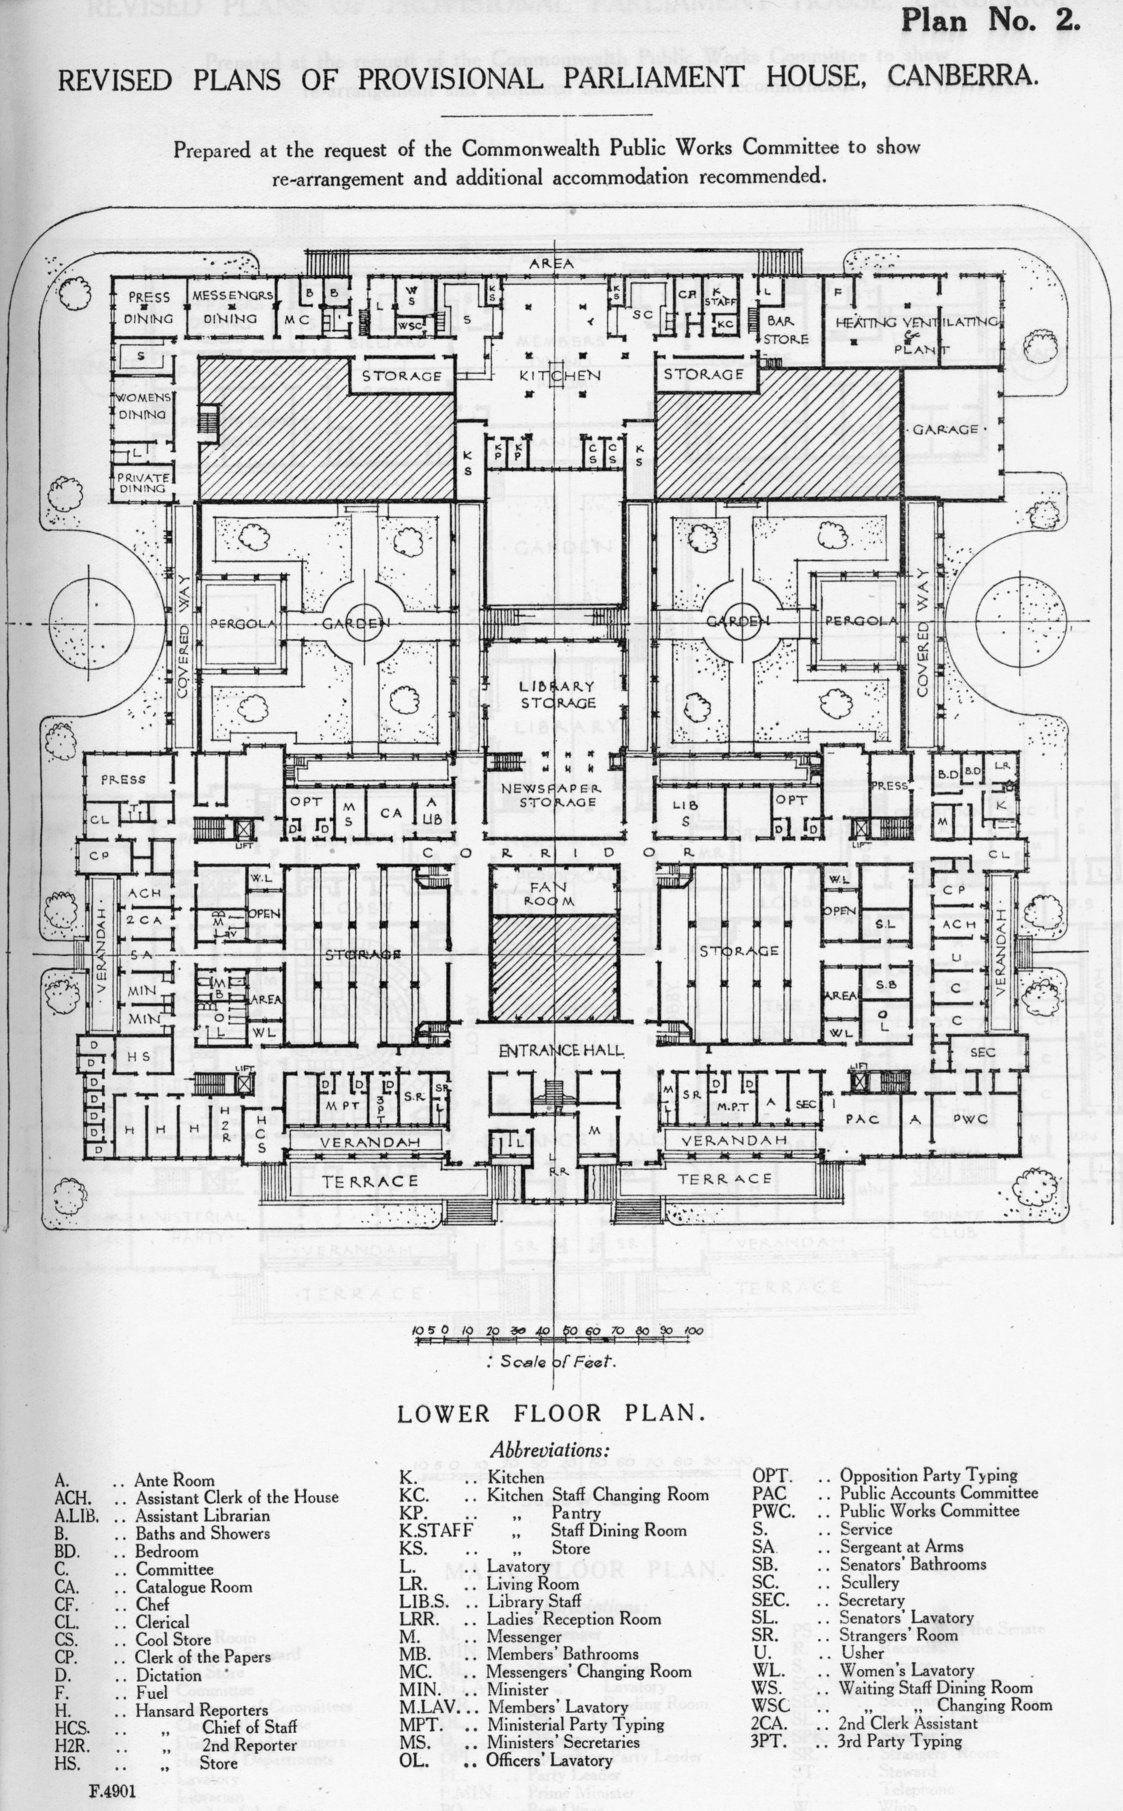 Revised Lower Floor Plans Of